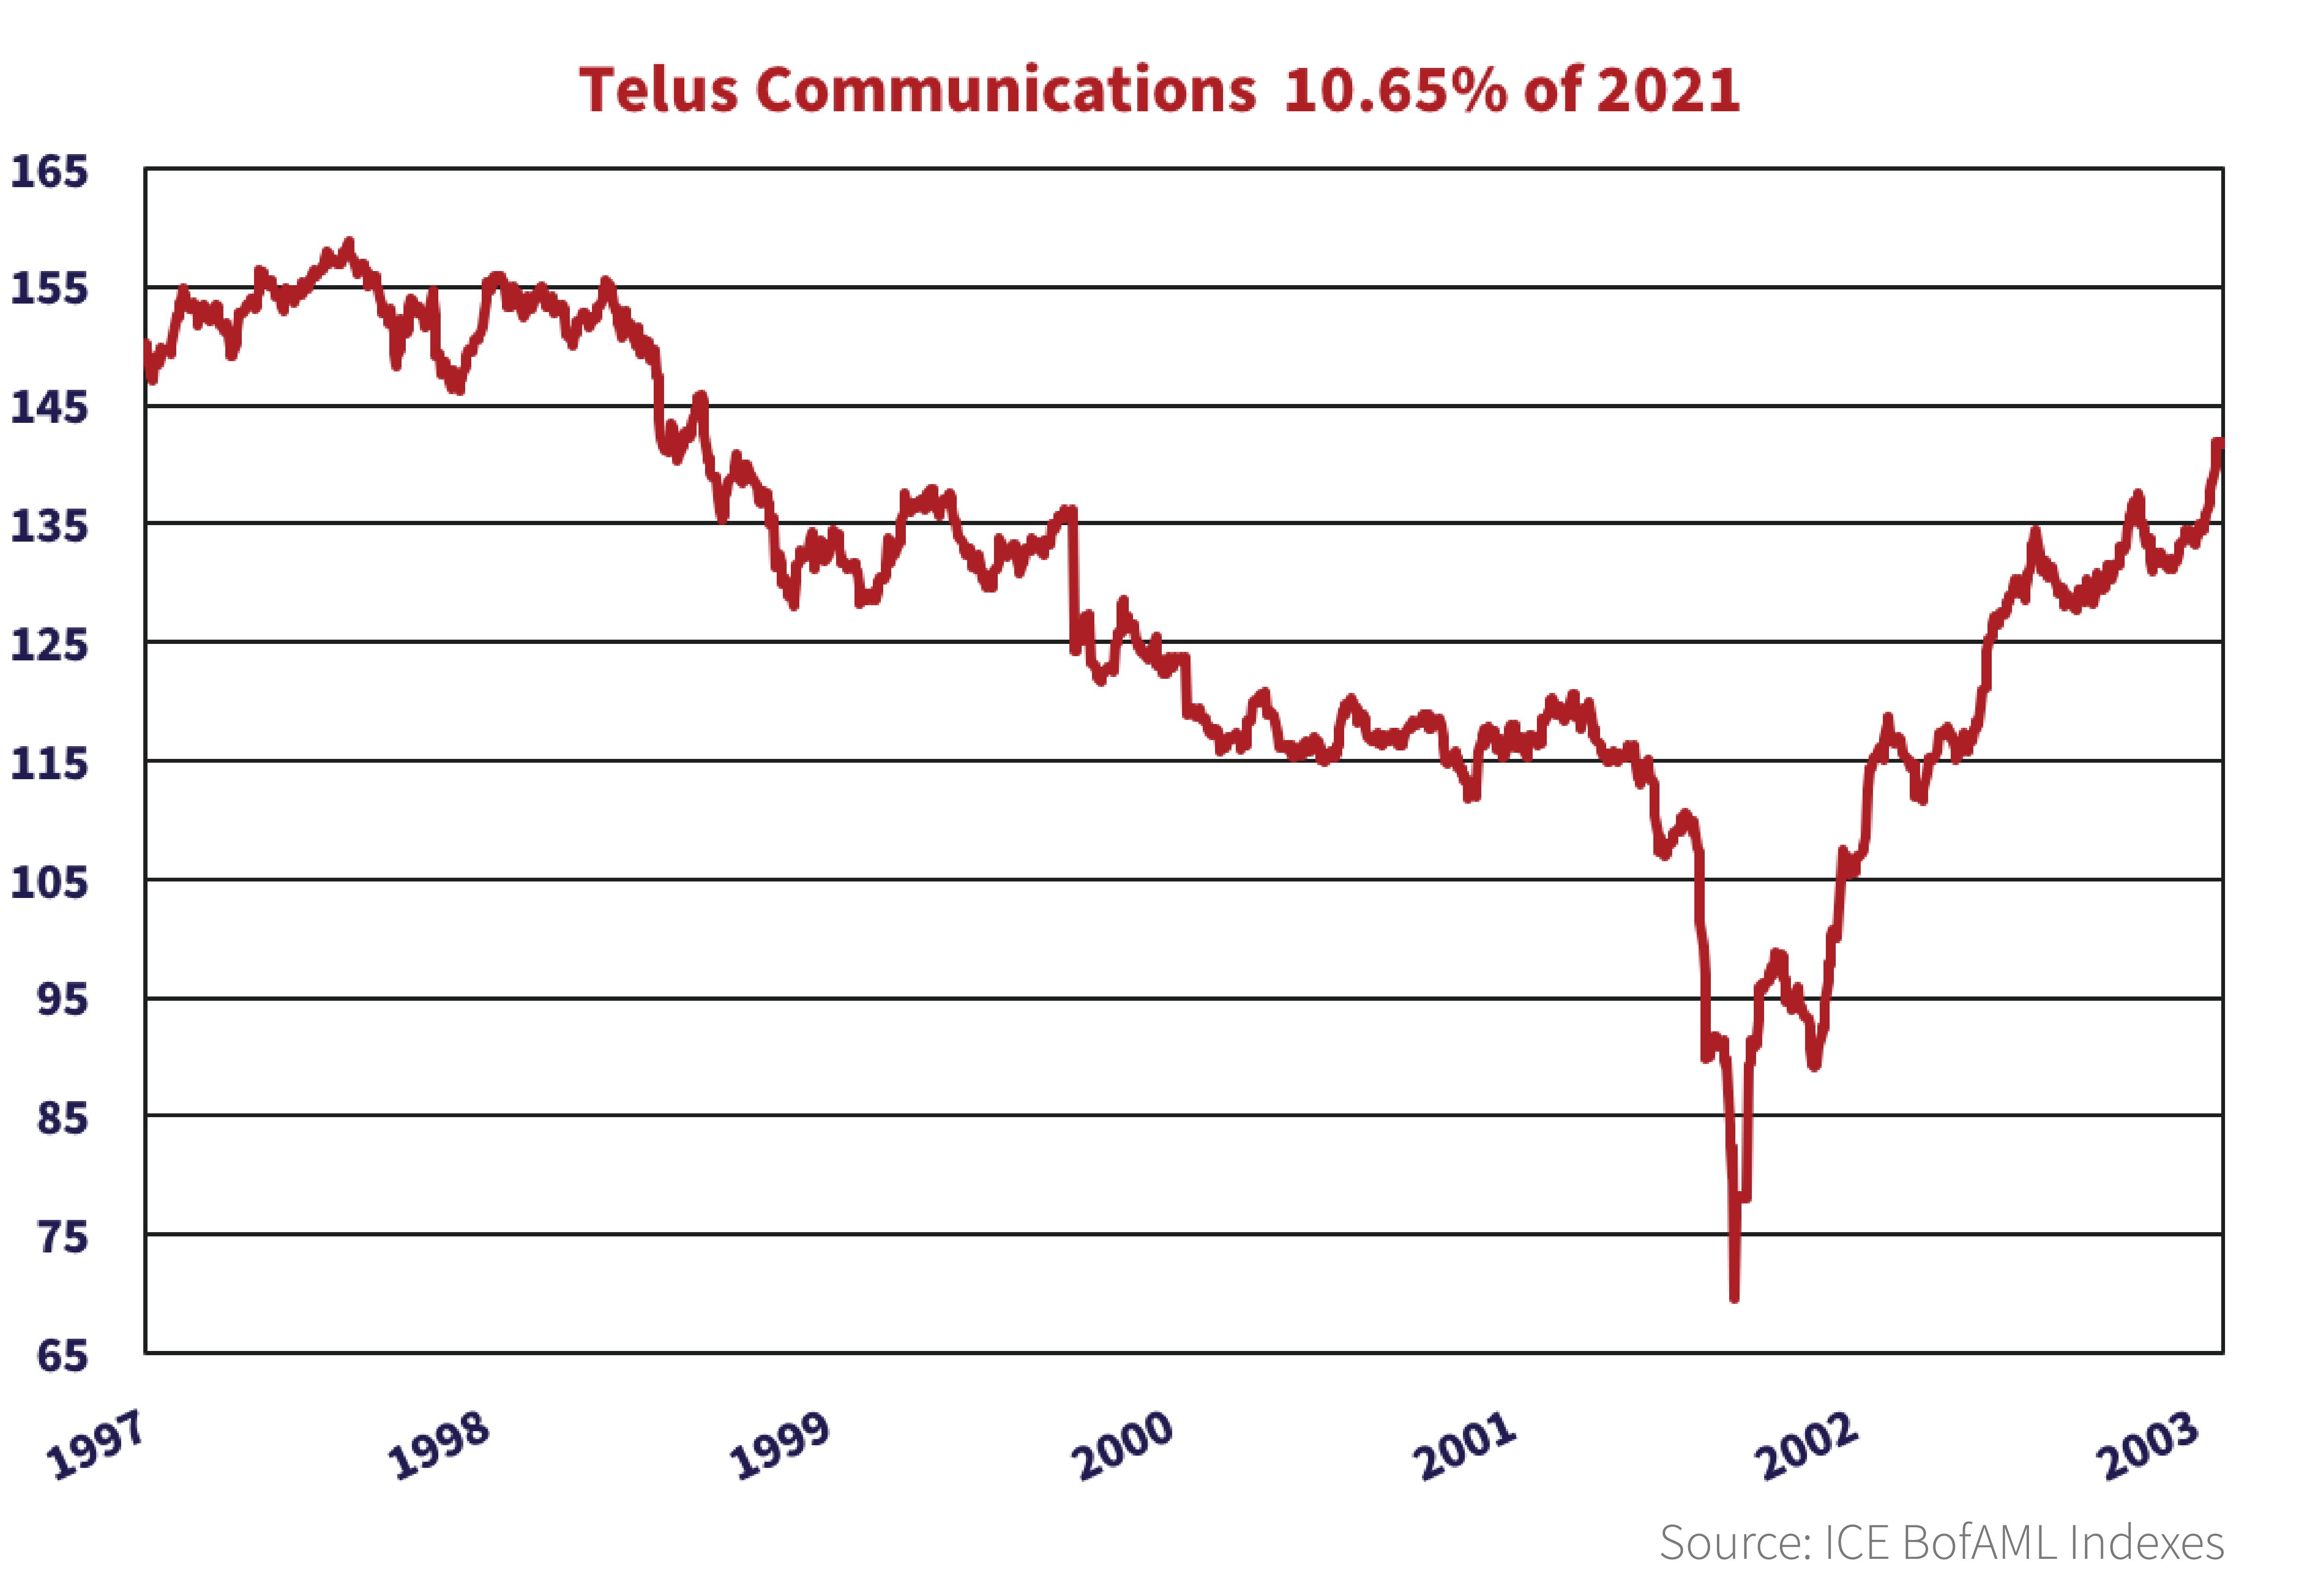 Line graph showing Telus Communications 10.65 percent of 2021 bonds